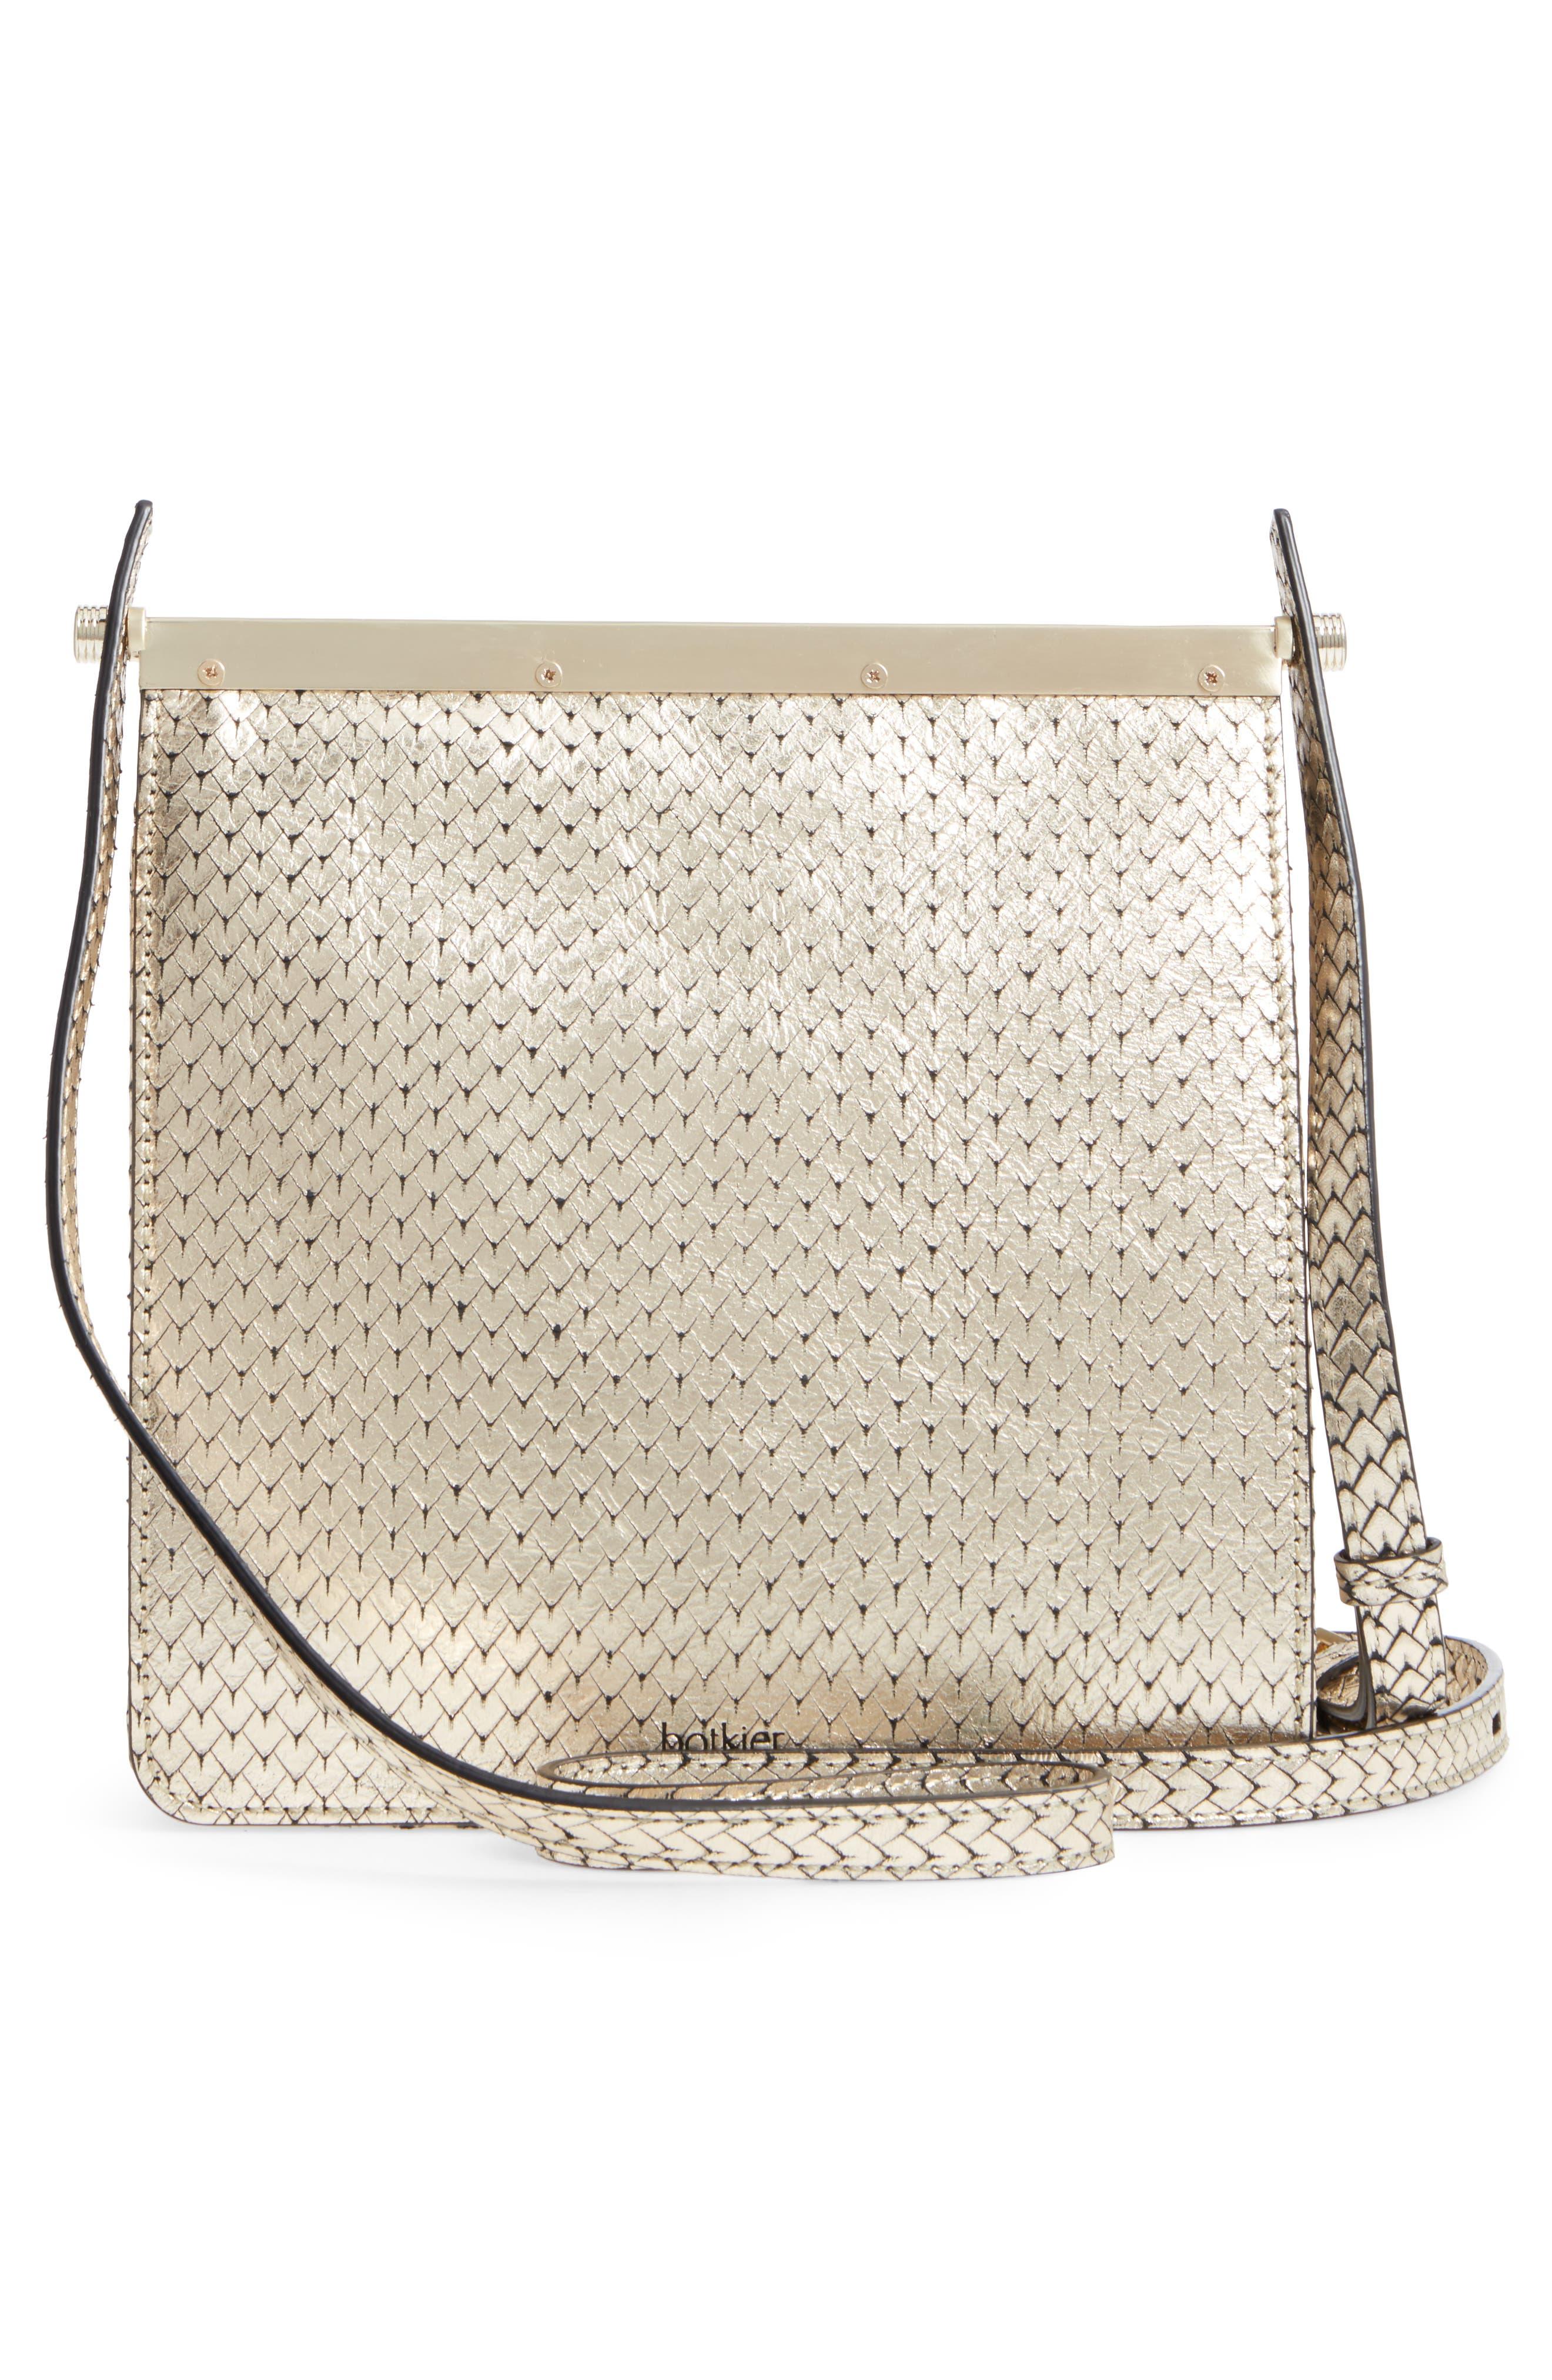 Crawford Calfskin Leather Crossbody Bag,                             Alternate thumbnail 9, color,